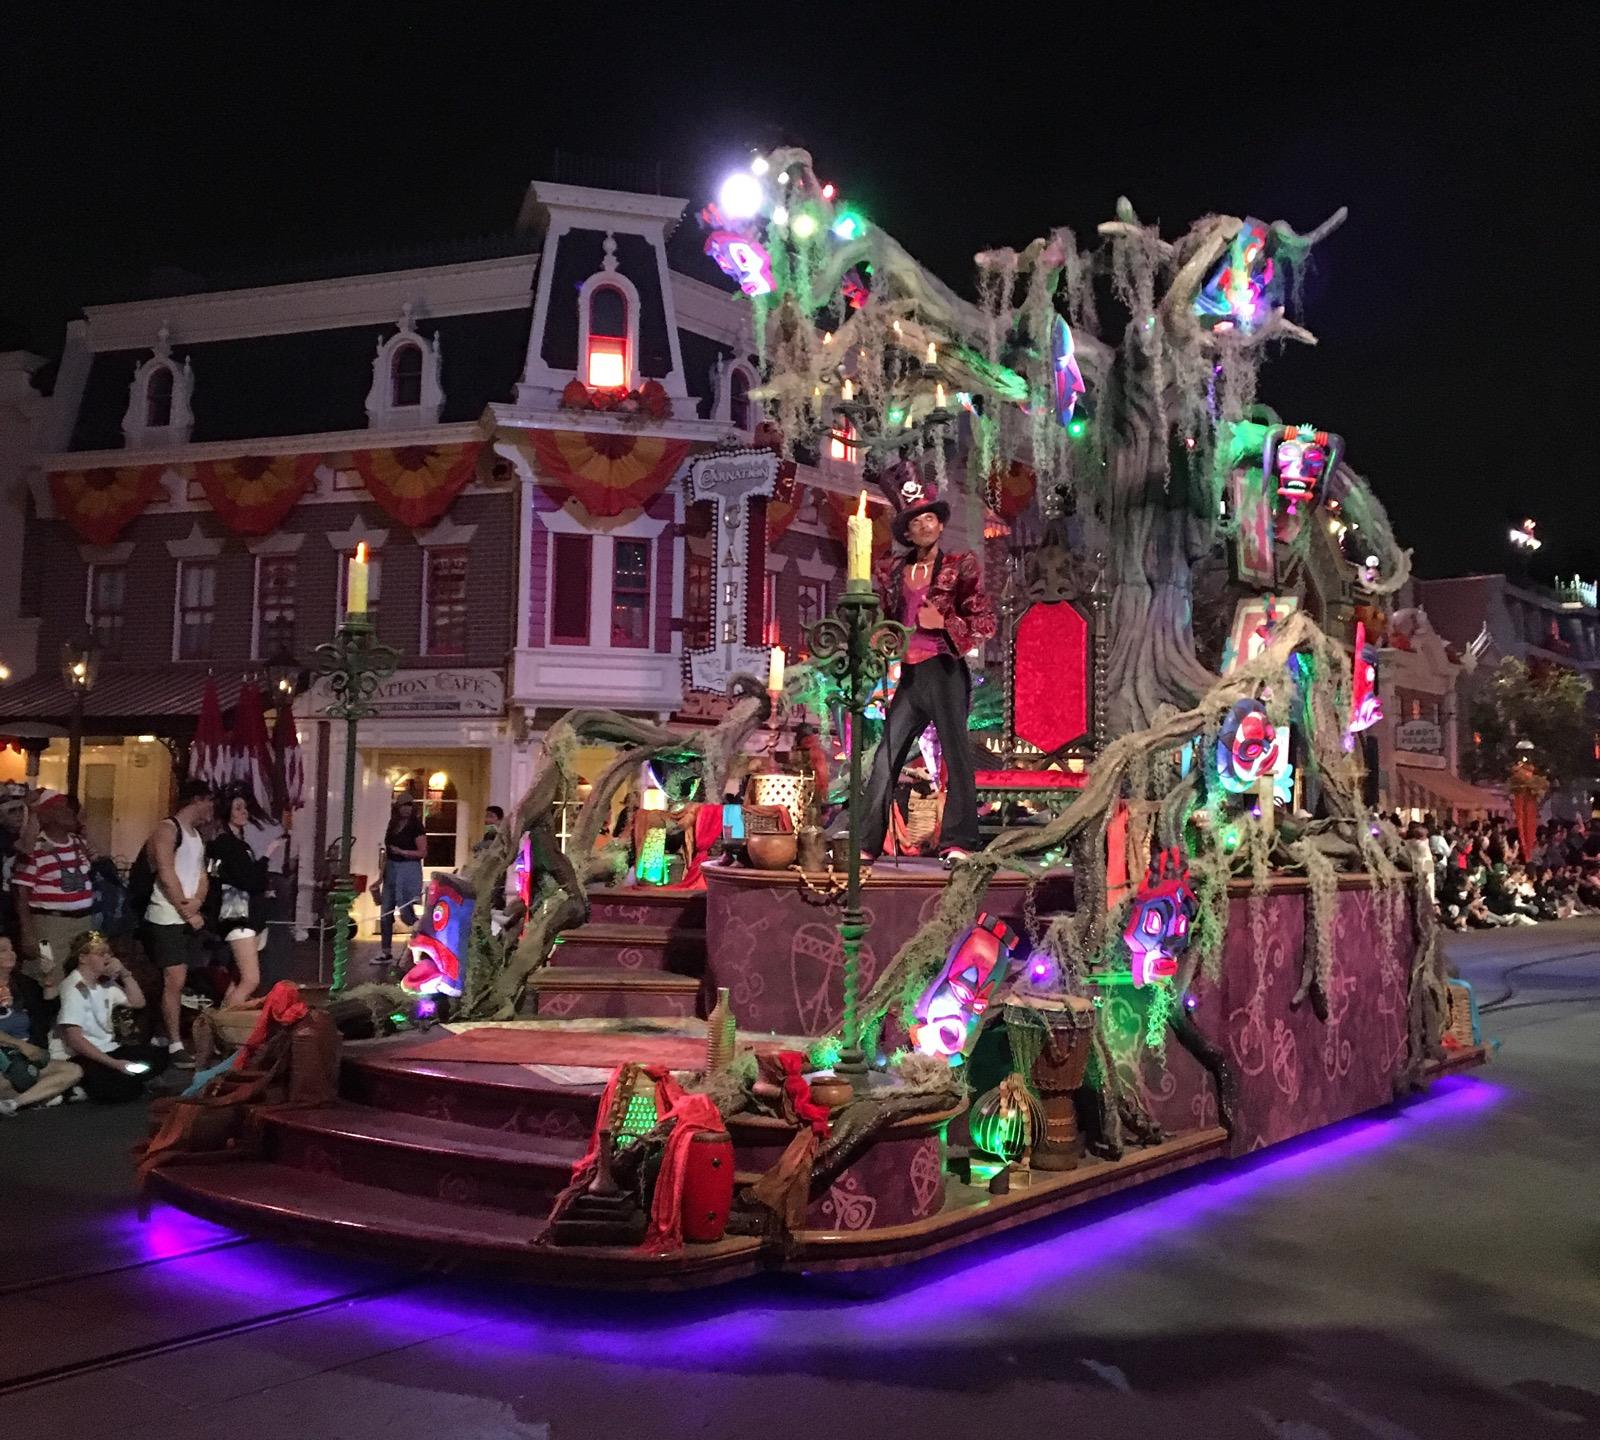 Oogie Boogie Bash 2019 Disney California Adventure. #Disneyland #Mickey'sHalloweenParty #MickeysHalloweenParty2019 #OogieBoogieBash #OogieBoogieBashDisneyland #Disneyland #DisneyCaliforniaAdventure #DCA #DisneylandHalloween